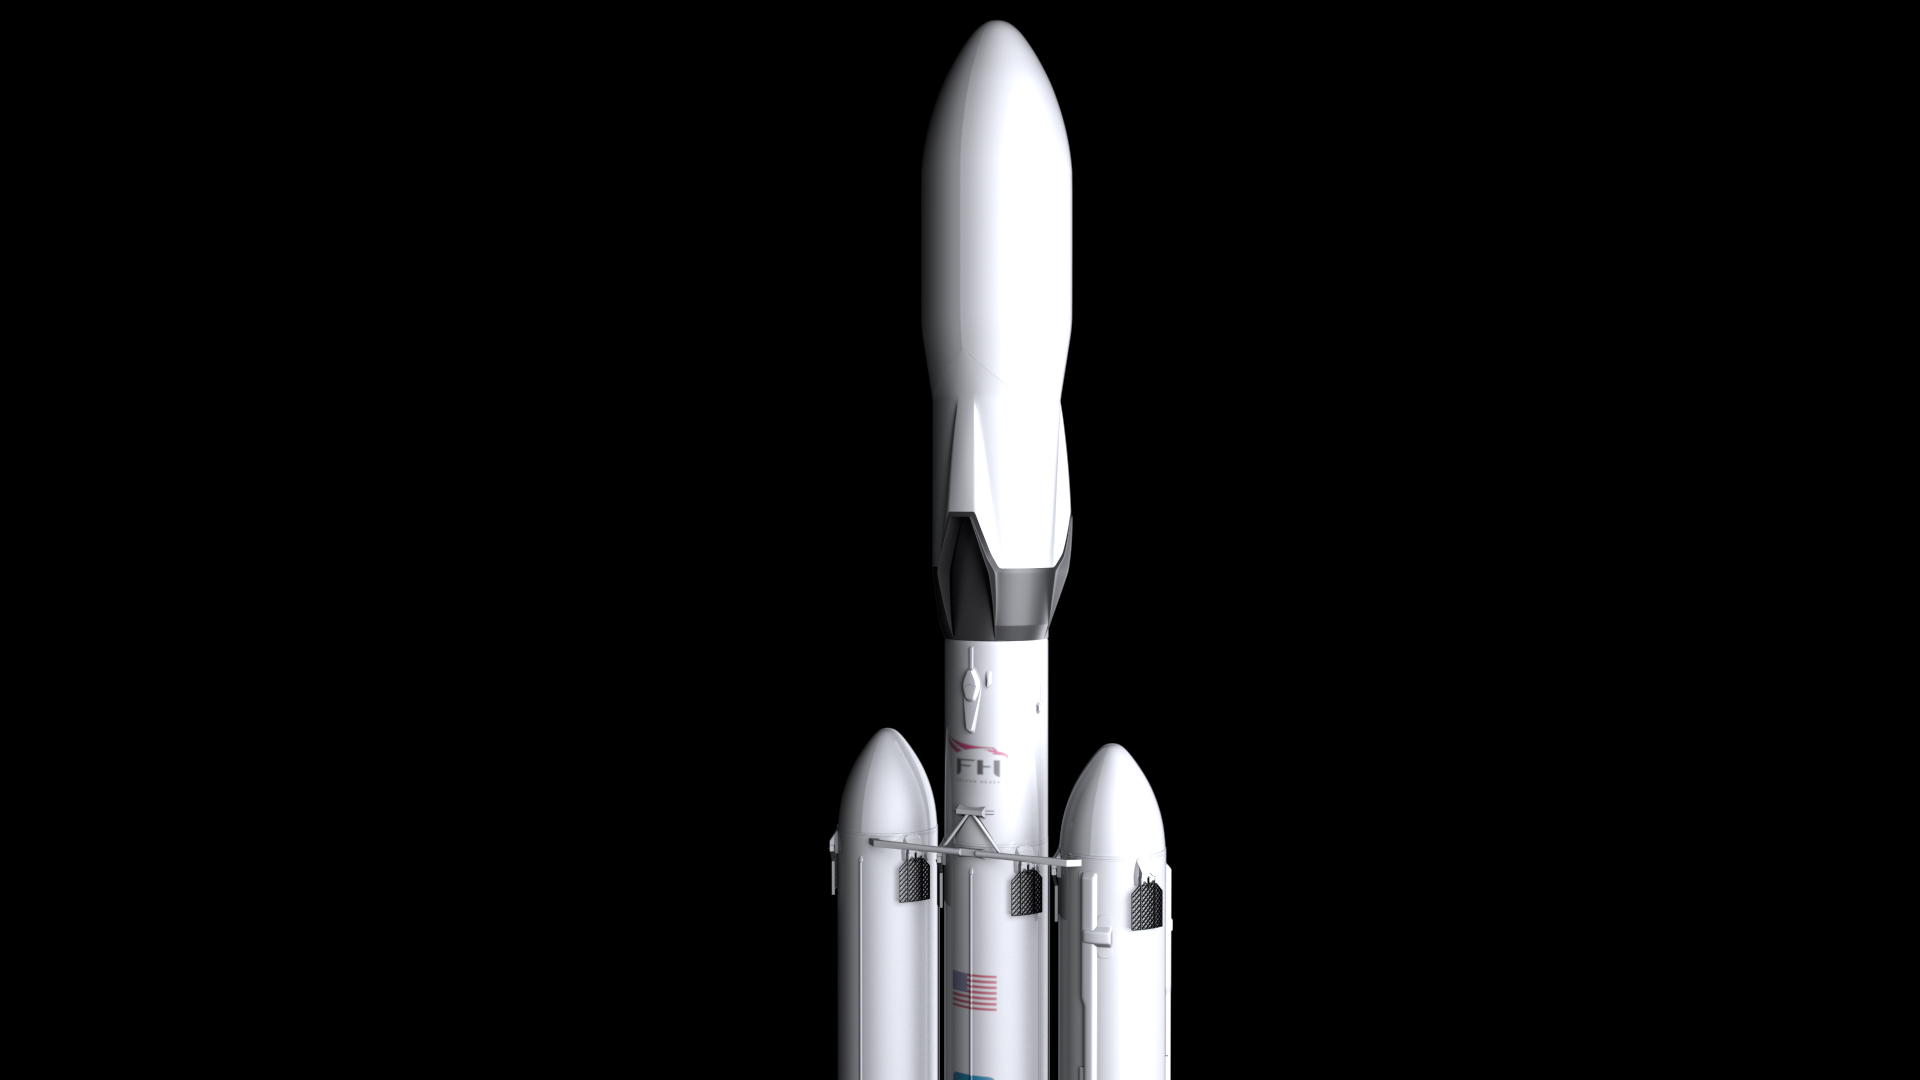 falcon heavy v1.2 fully reusable 3d model max fbx c4d lwo ma mb hrc xsi obj 277859